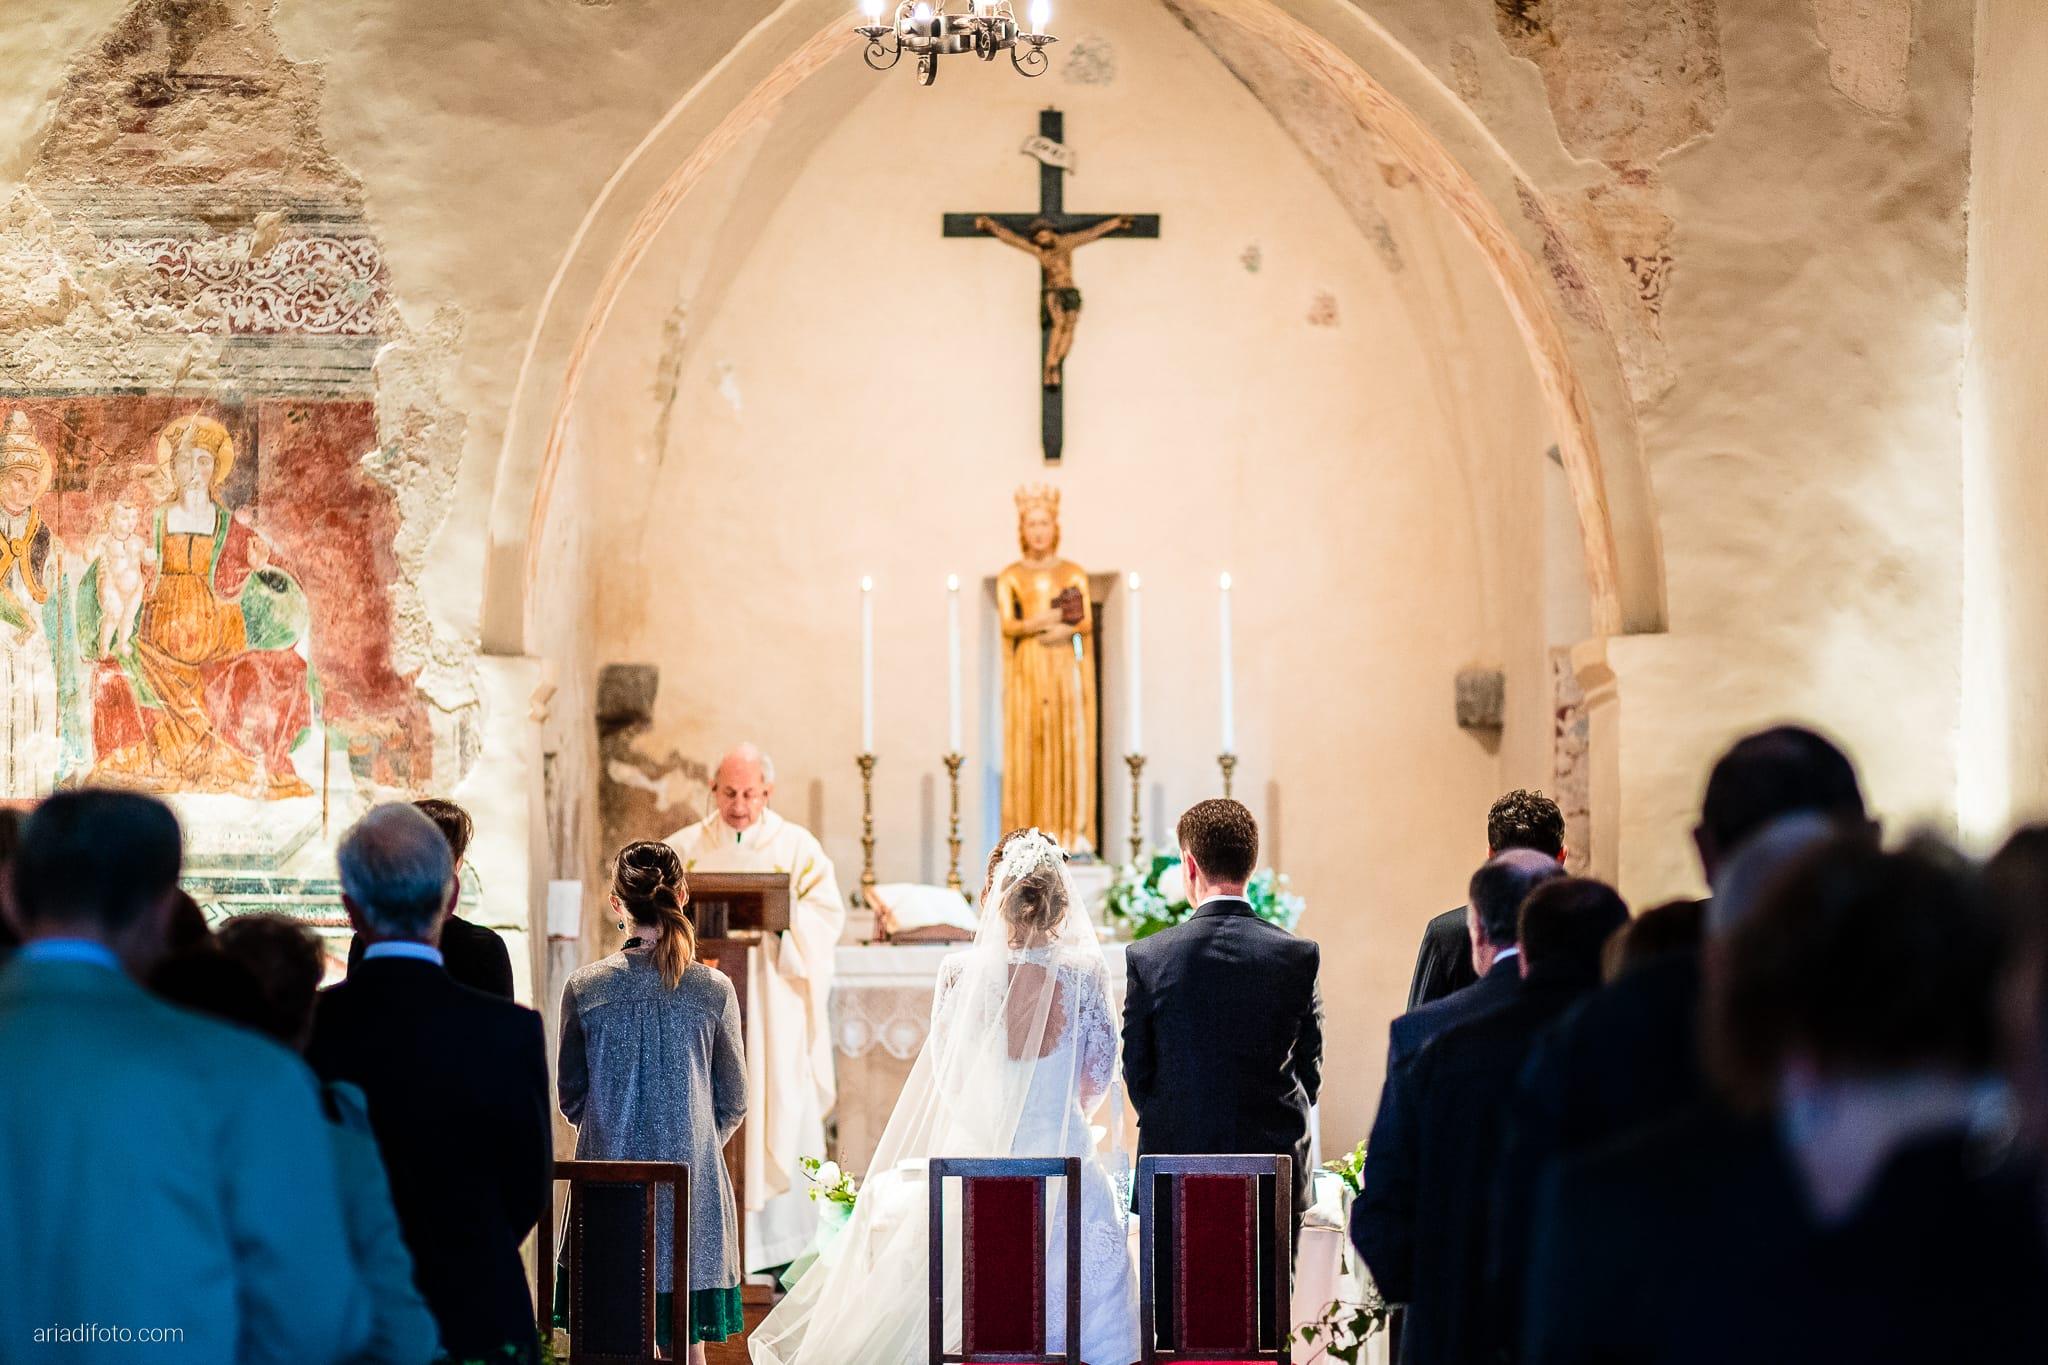 Eleonora Elia Matrimonio Chiesa Santa Eufemia Tarcento Udine Baronesse Tacco Gorizia cerimonia